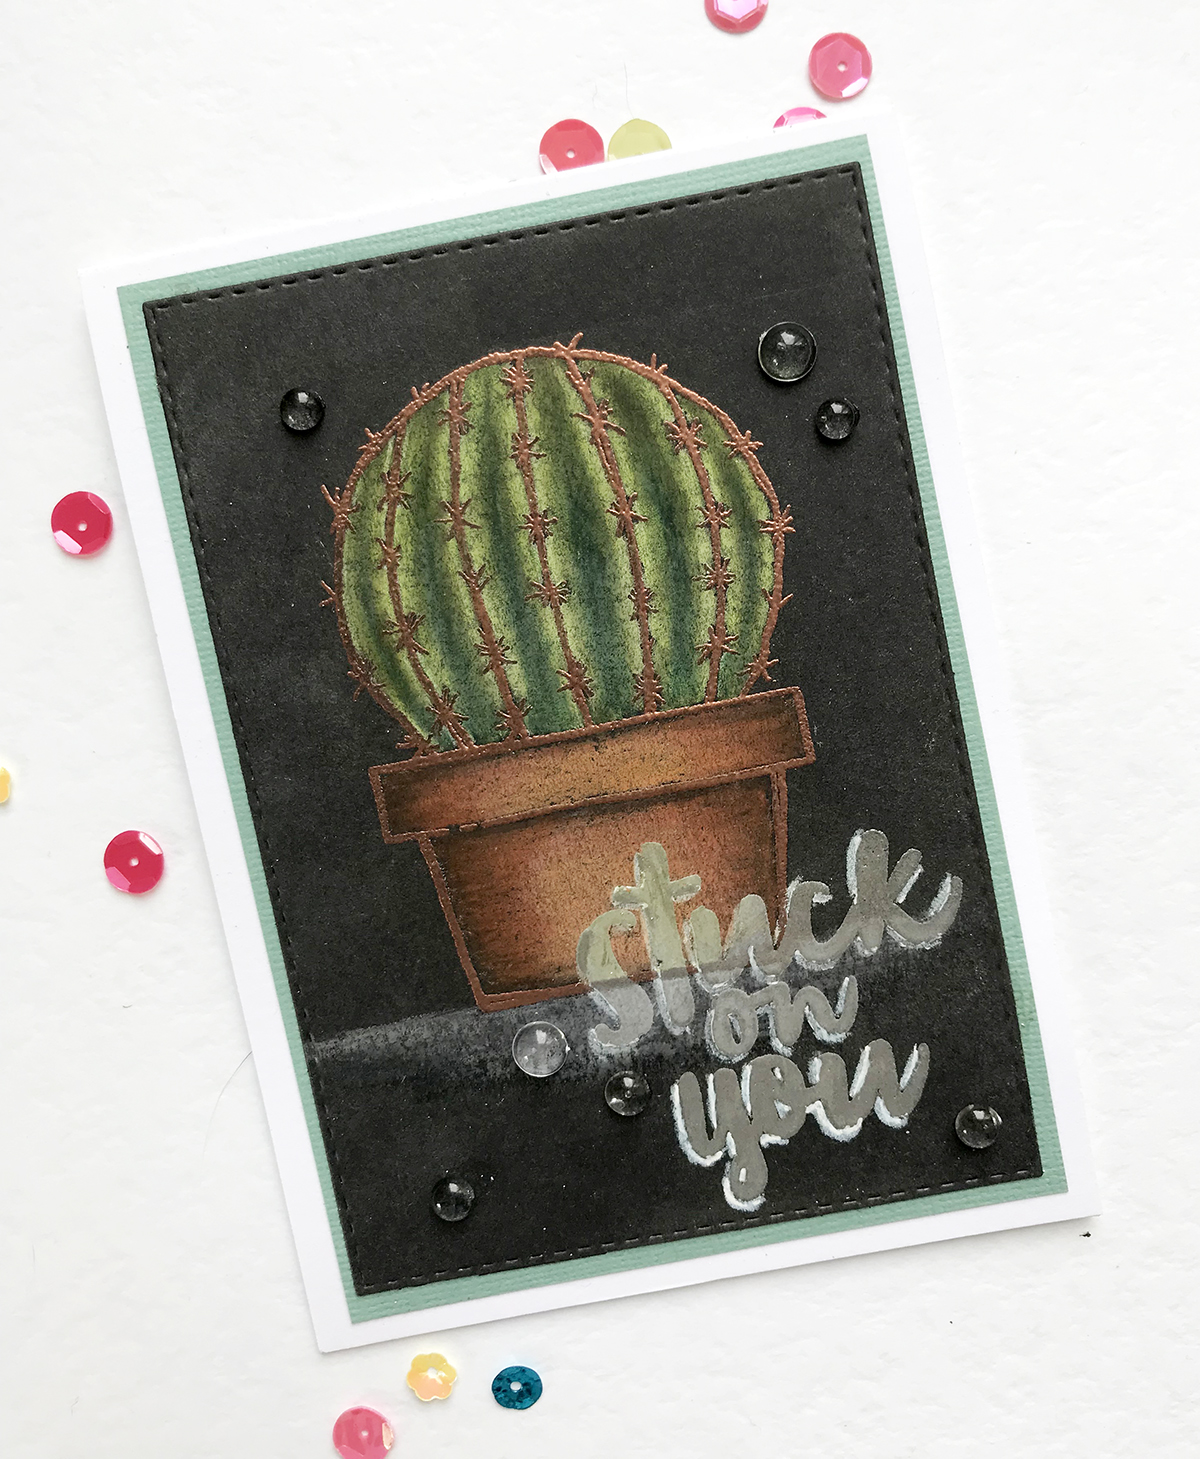 maya isaksson embossed cactus